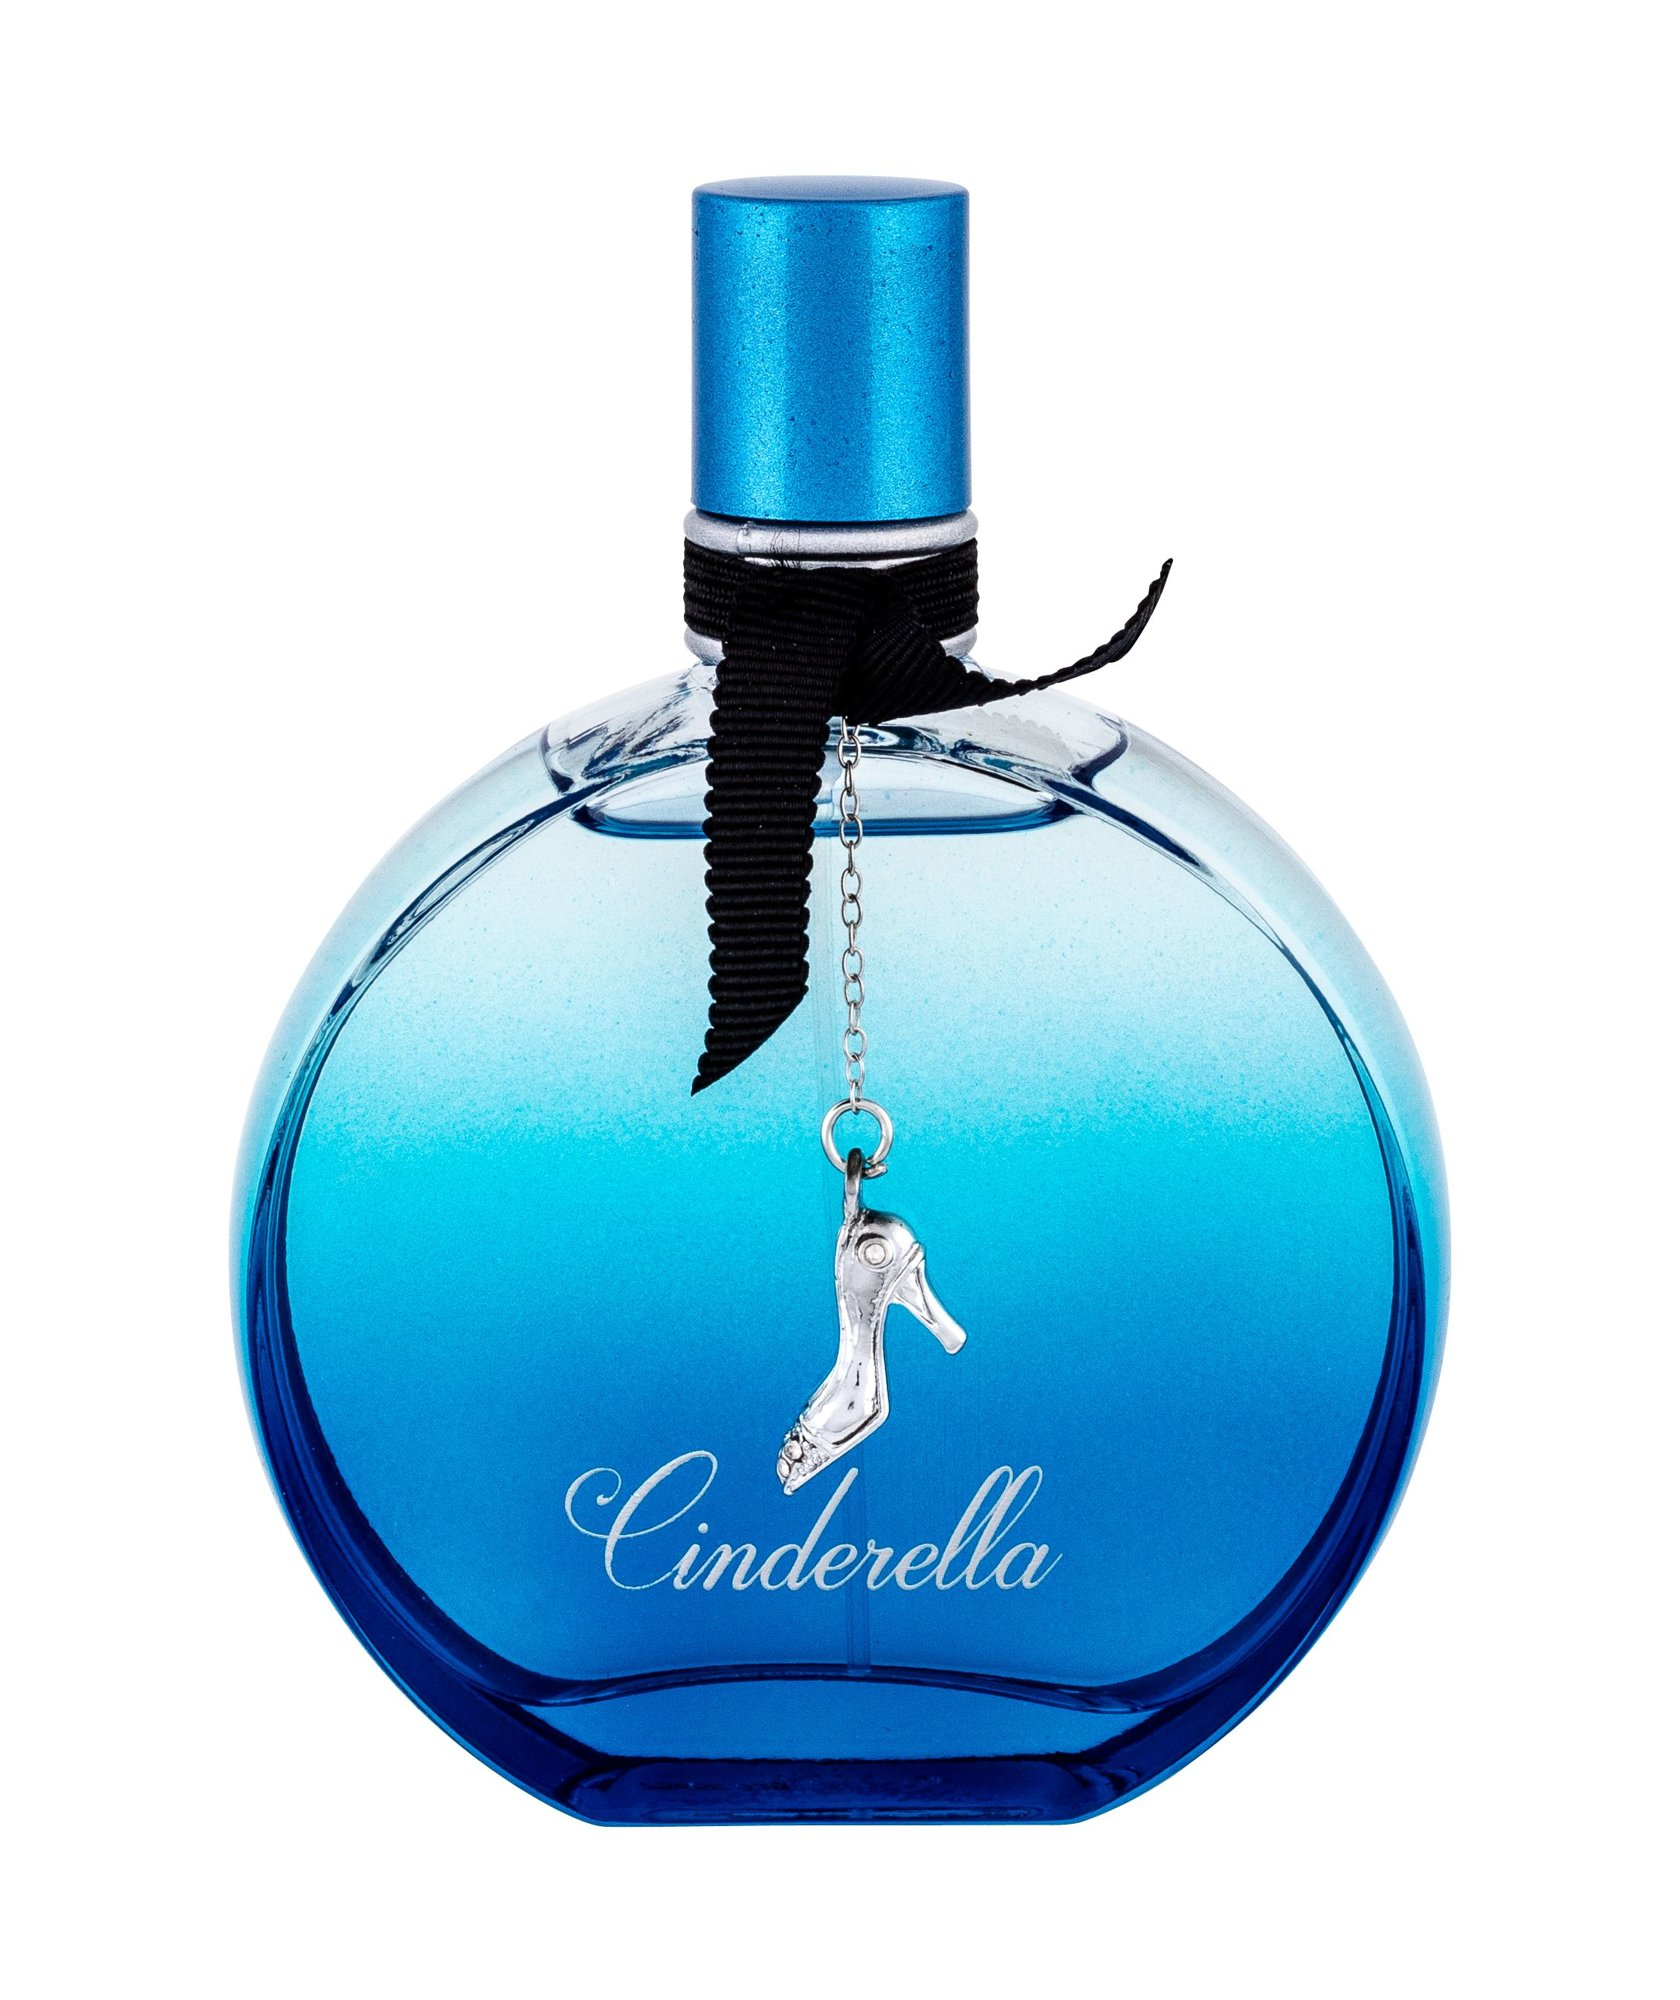 Disney Princess Cinderella Eau de Parfum 100ml